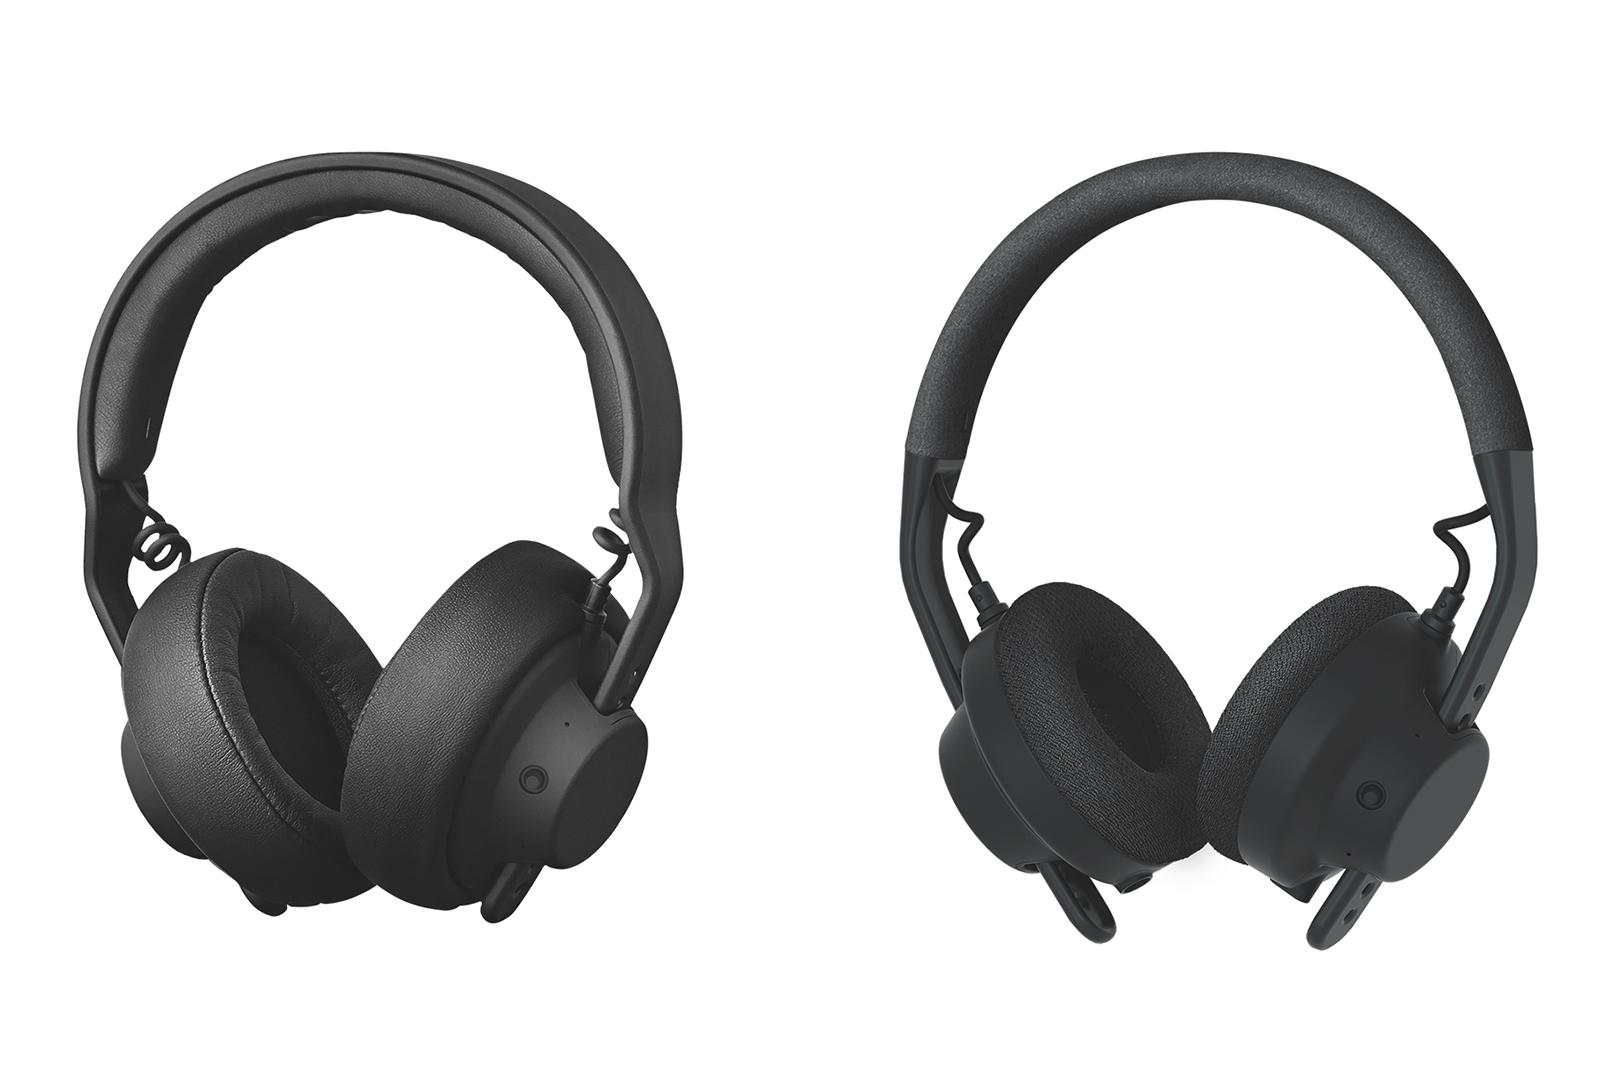 AIAIAI releasing two new headphones, TMA-2 Move Wireless & TMA-2 Move XE Wireless